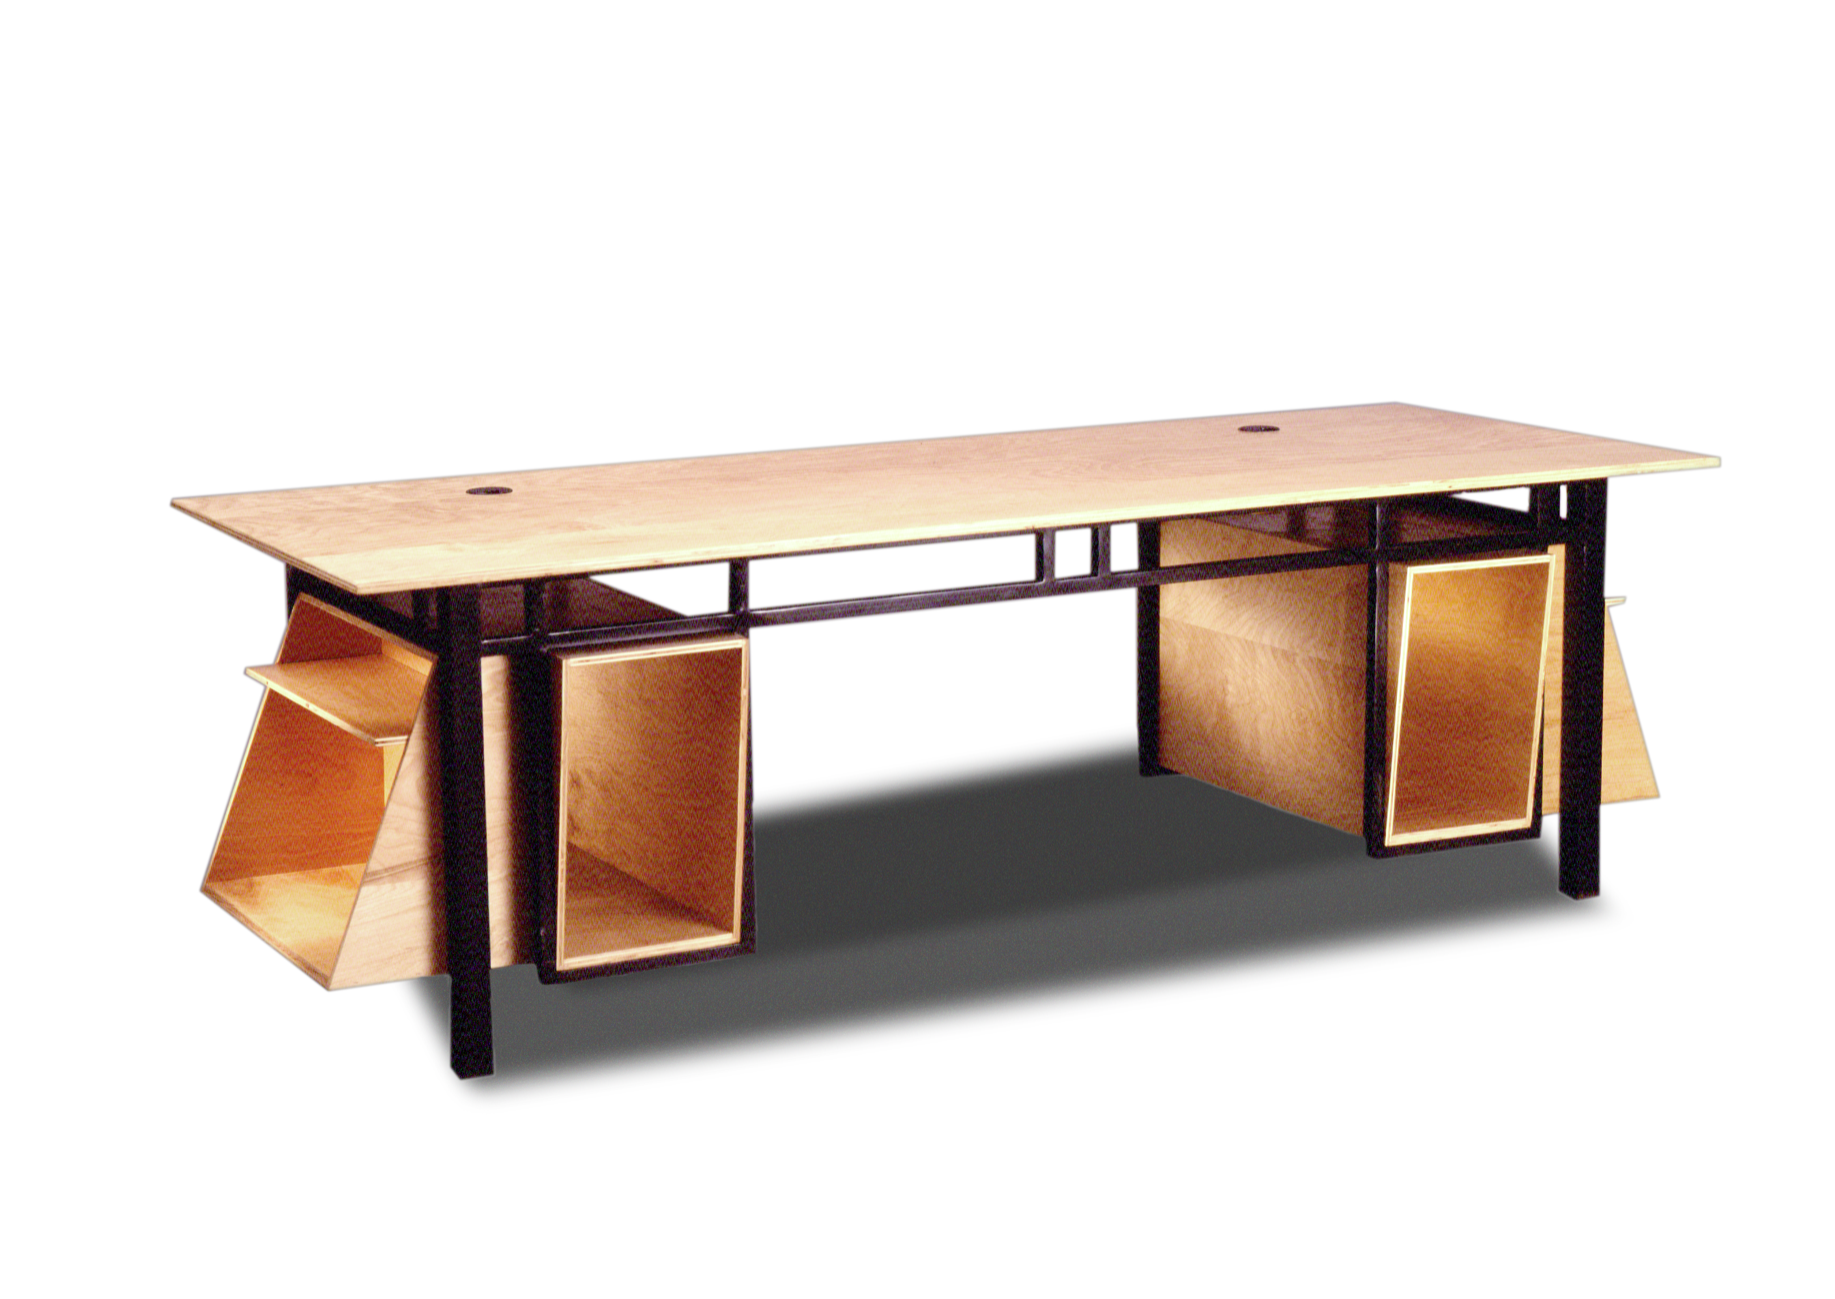 Double Sided Desk By Dale Frommelt Design Design Desk Dale